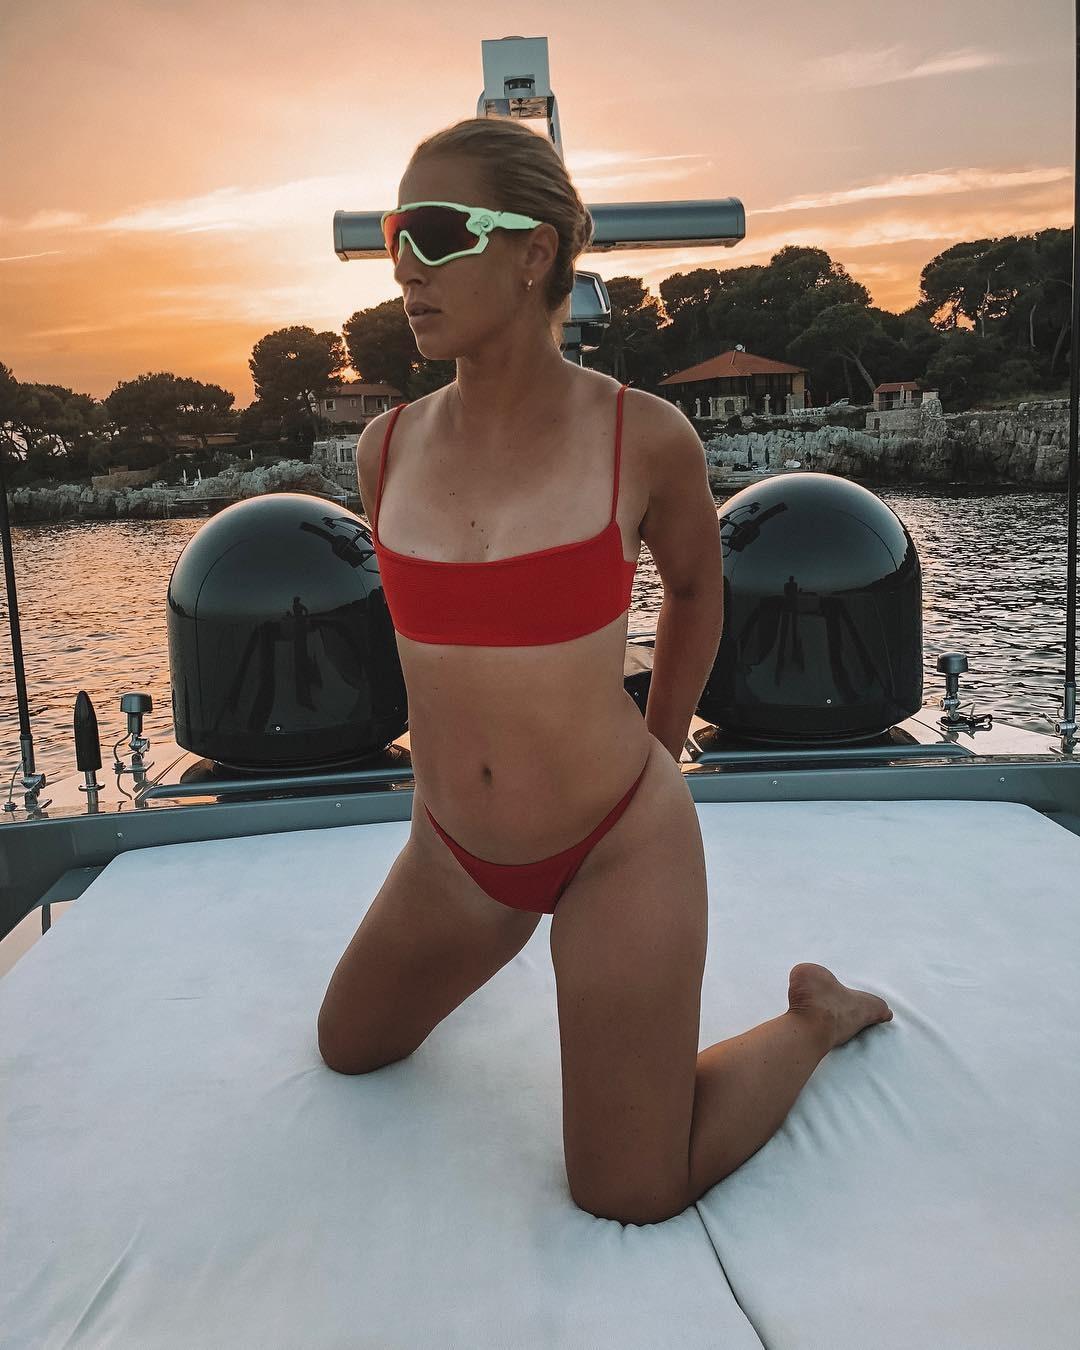 meet sexy girls in katowice